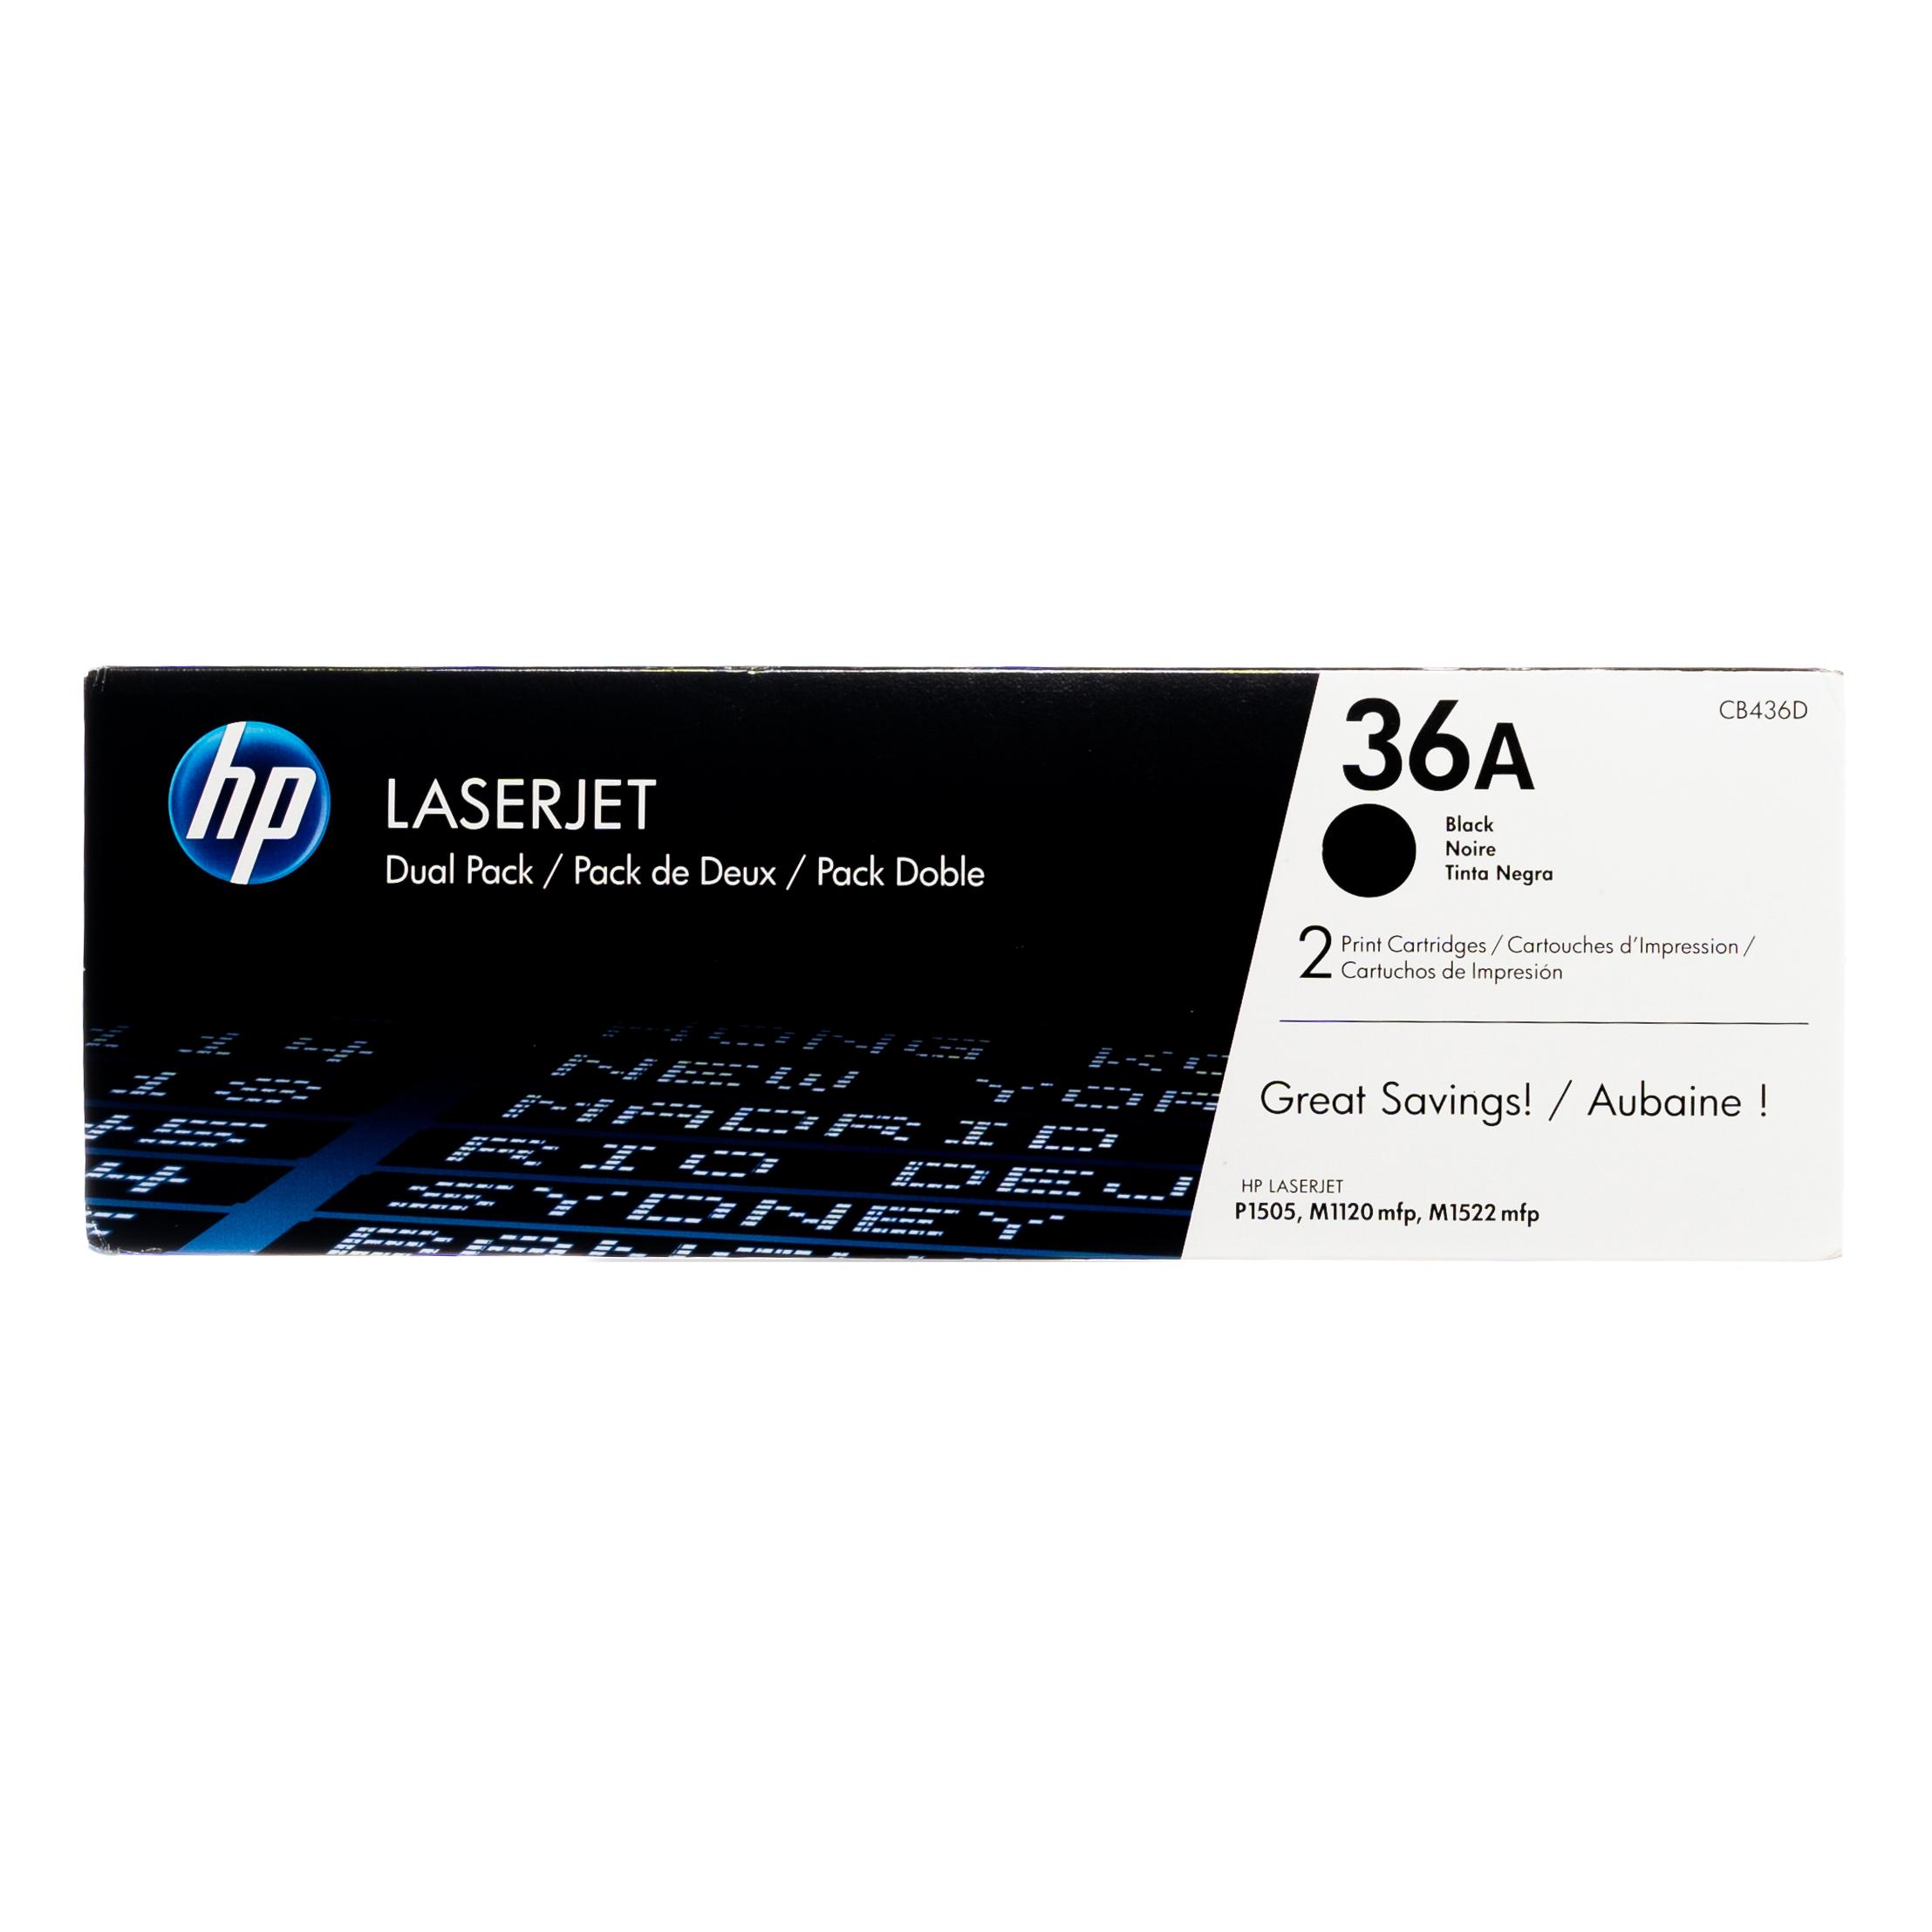 CB436D | HP 36A | Original HP Dual Pack Toner Cartridges – Black